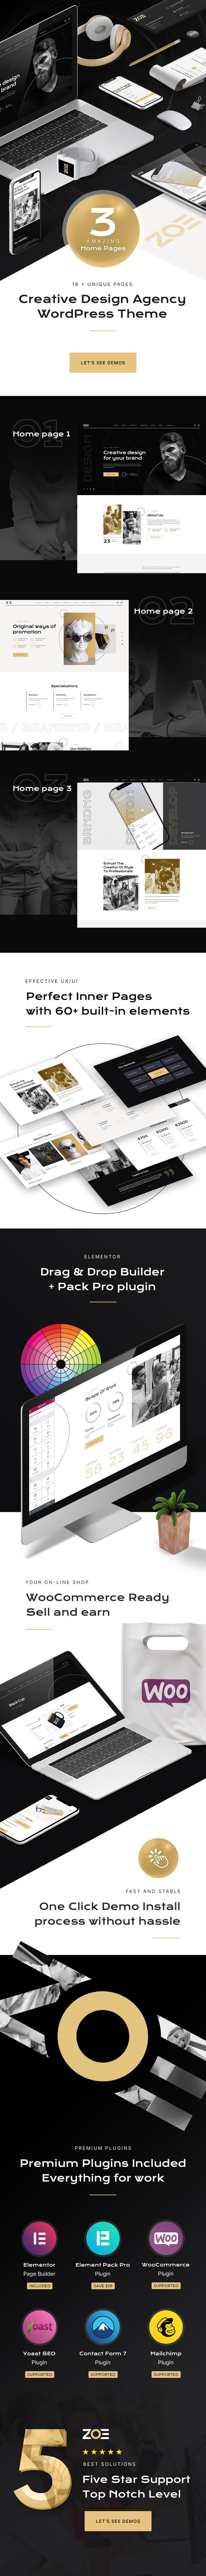 ZOE - Creative Design Agency WordPress Theme